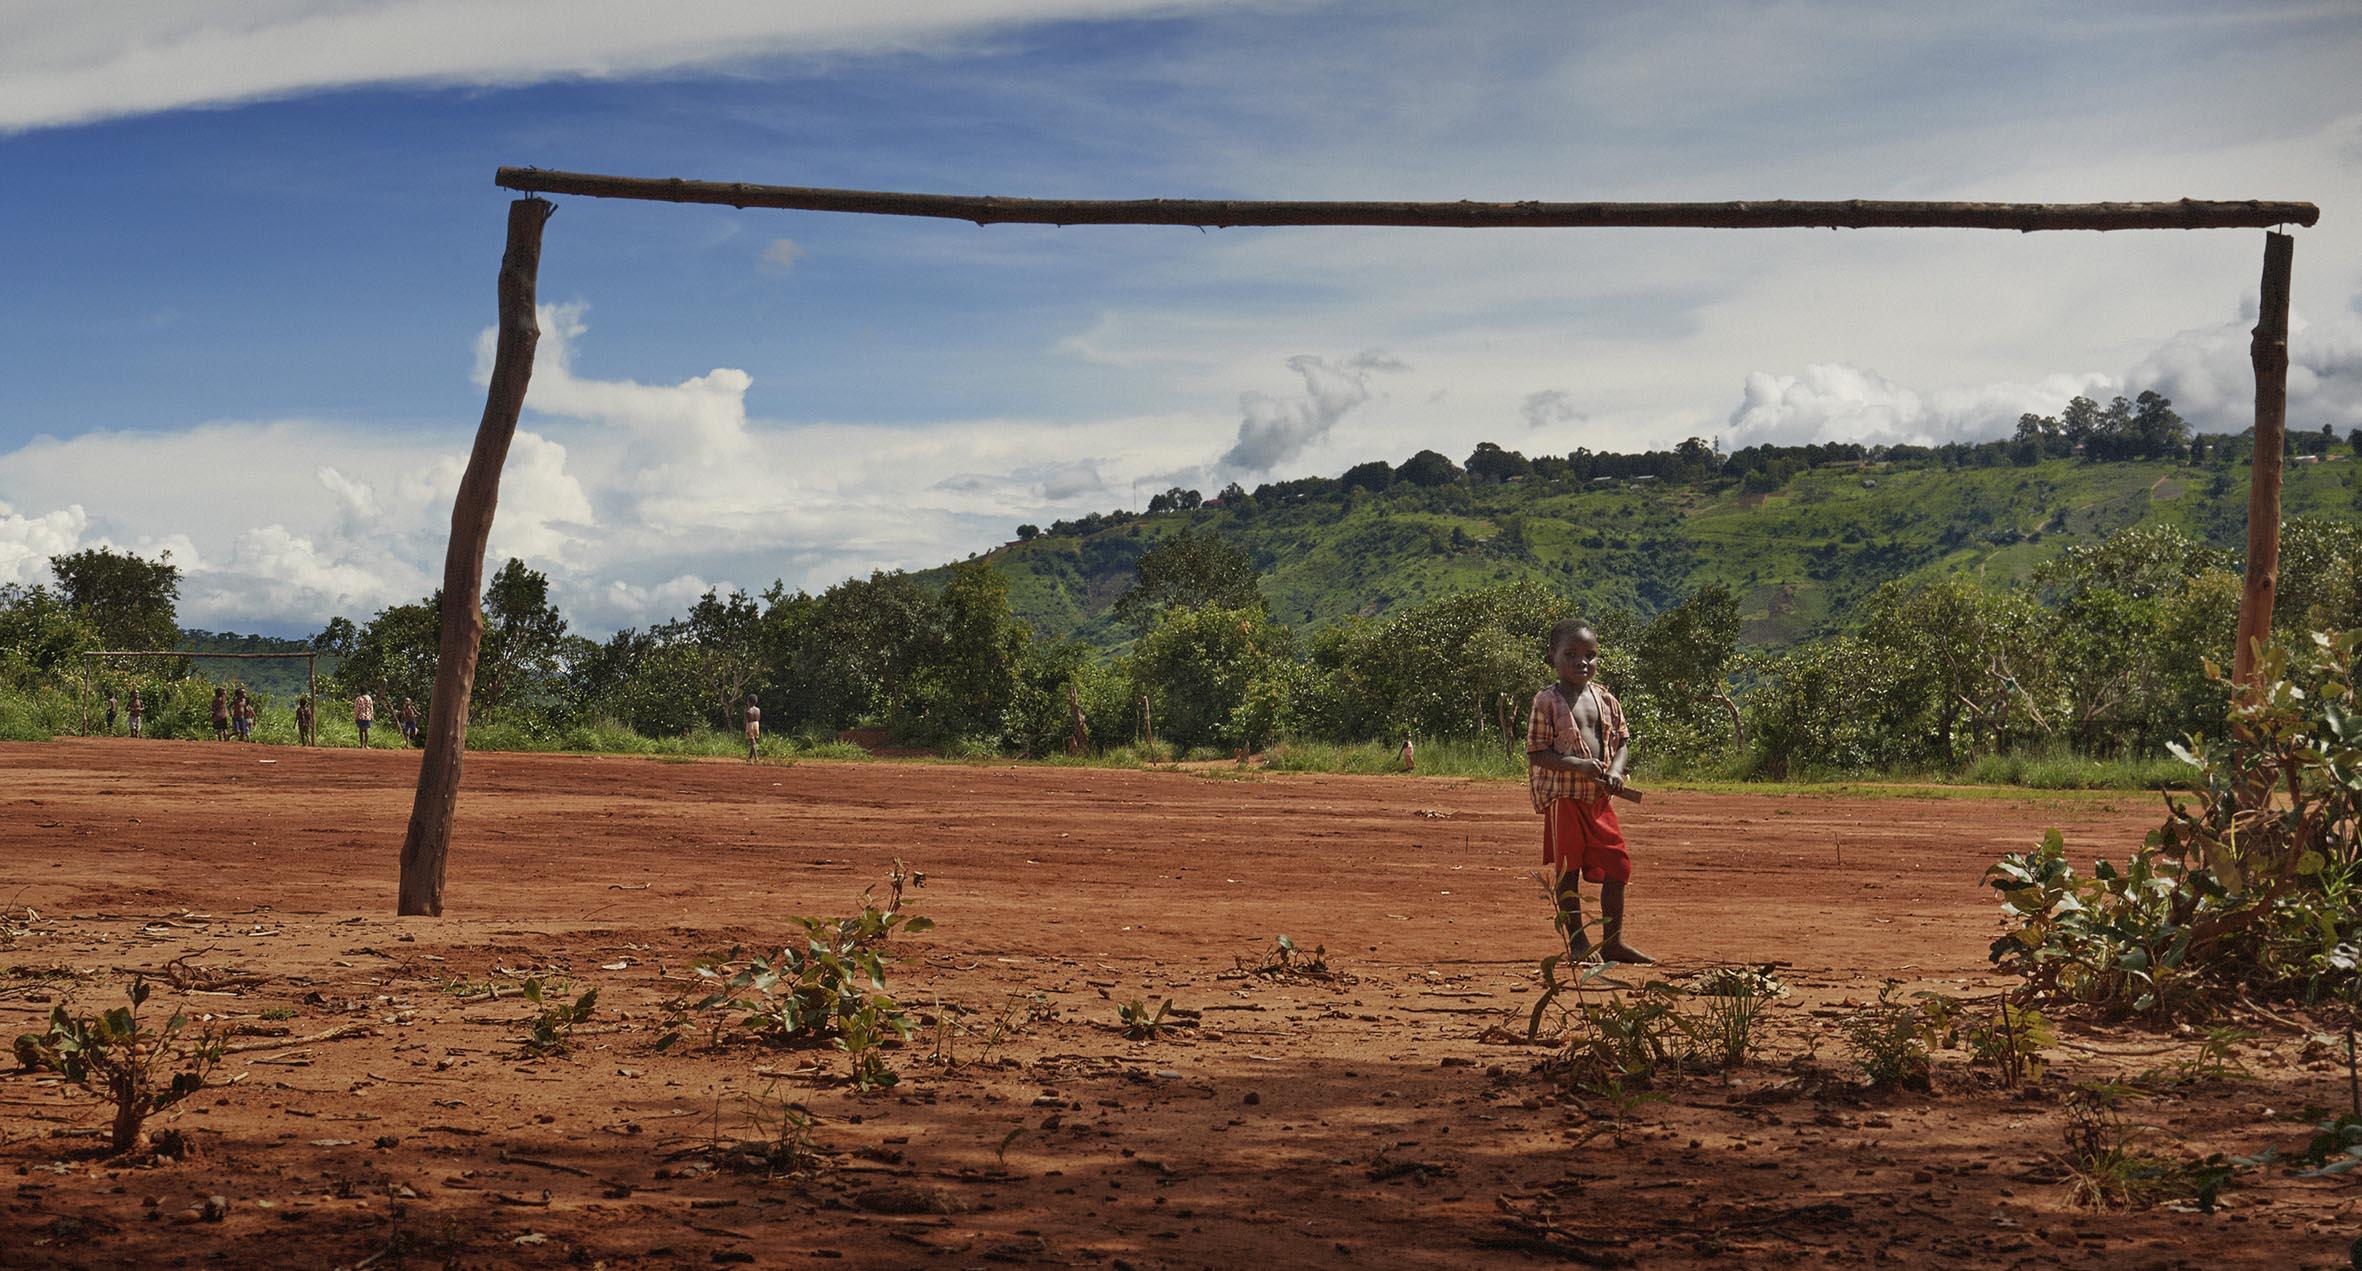 Malawi / George McLeod